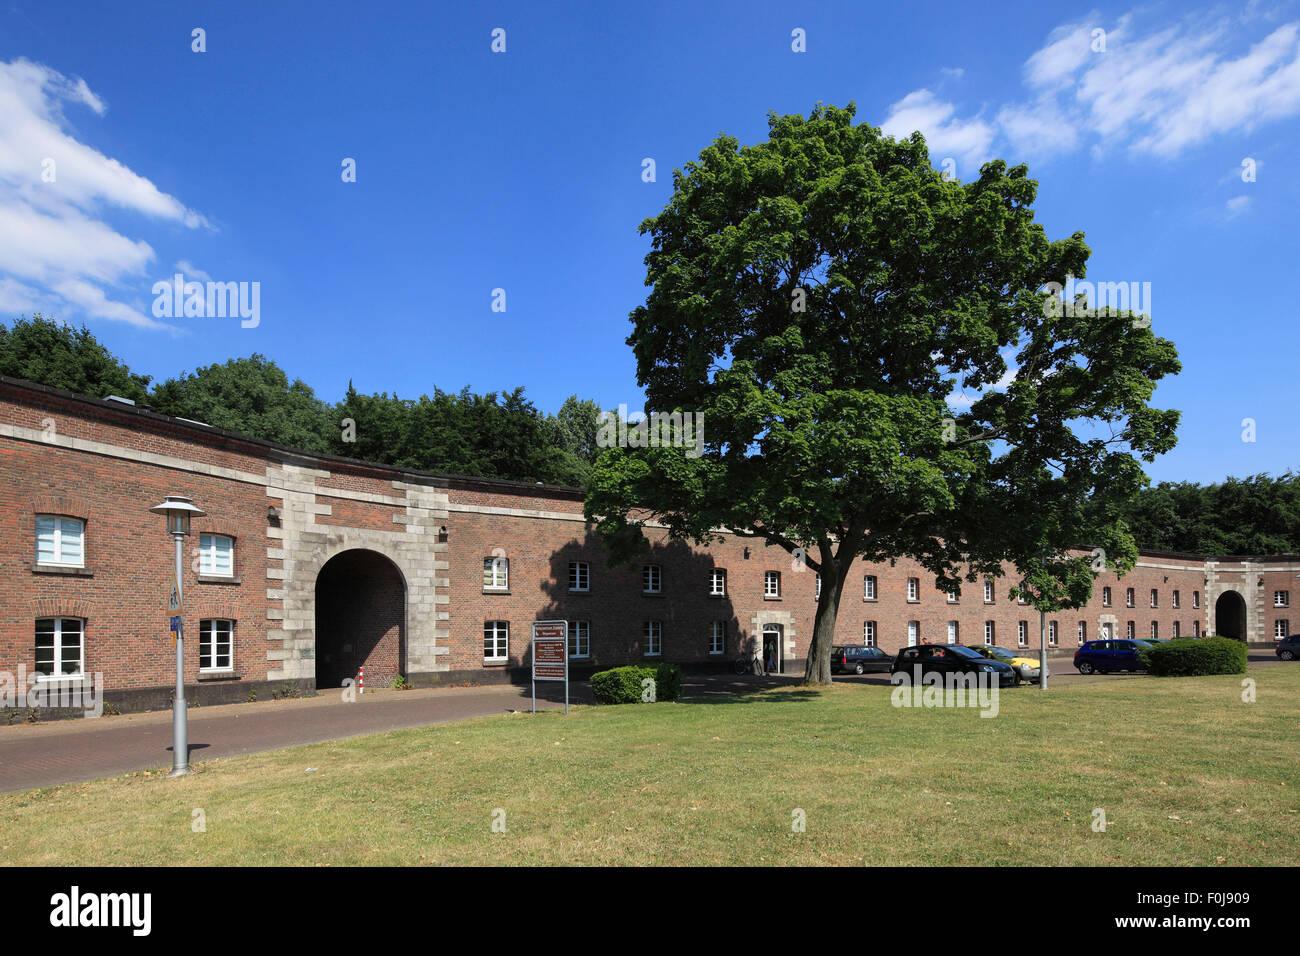 D-Wesel, Rhine, Lower Rhine, Rhineland, North Rhine-Westphalia, NRW, fortress city, garrison town, Citadel Wesel, - Stock Image